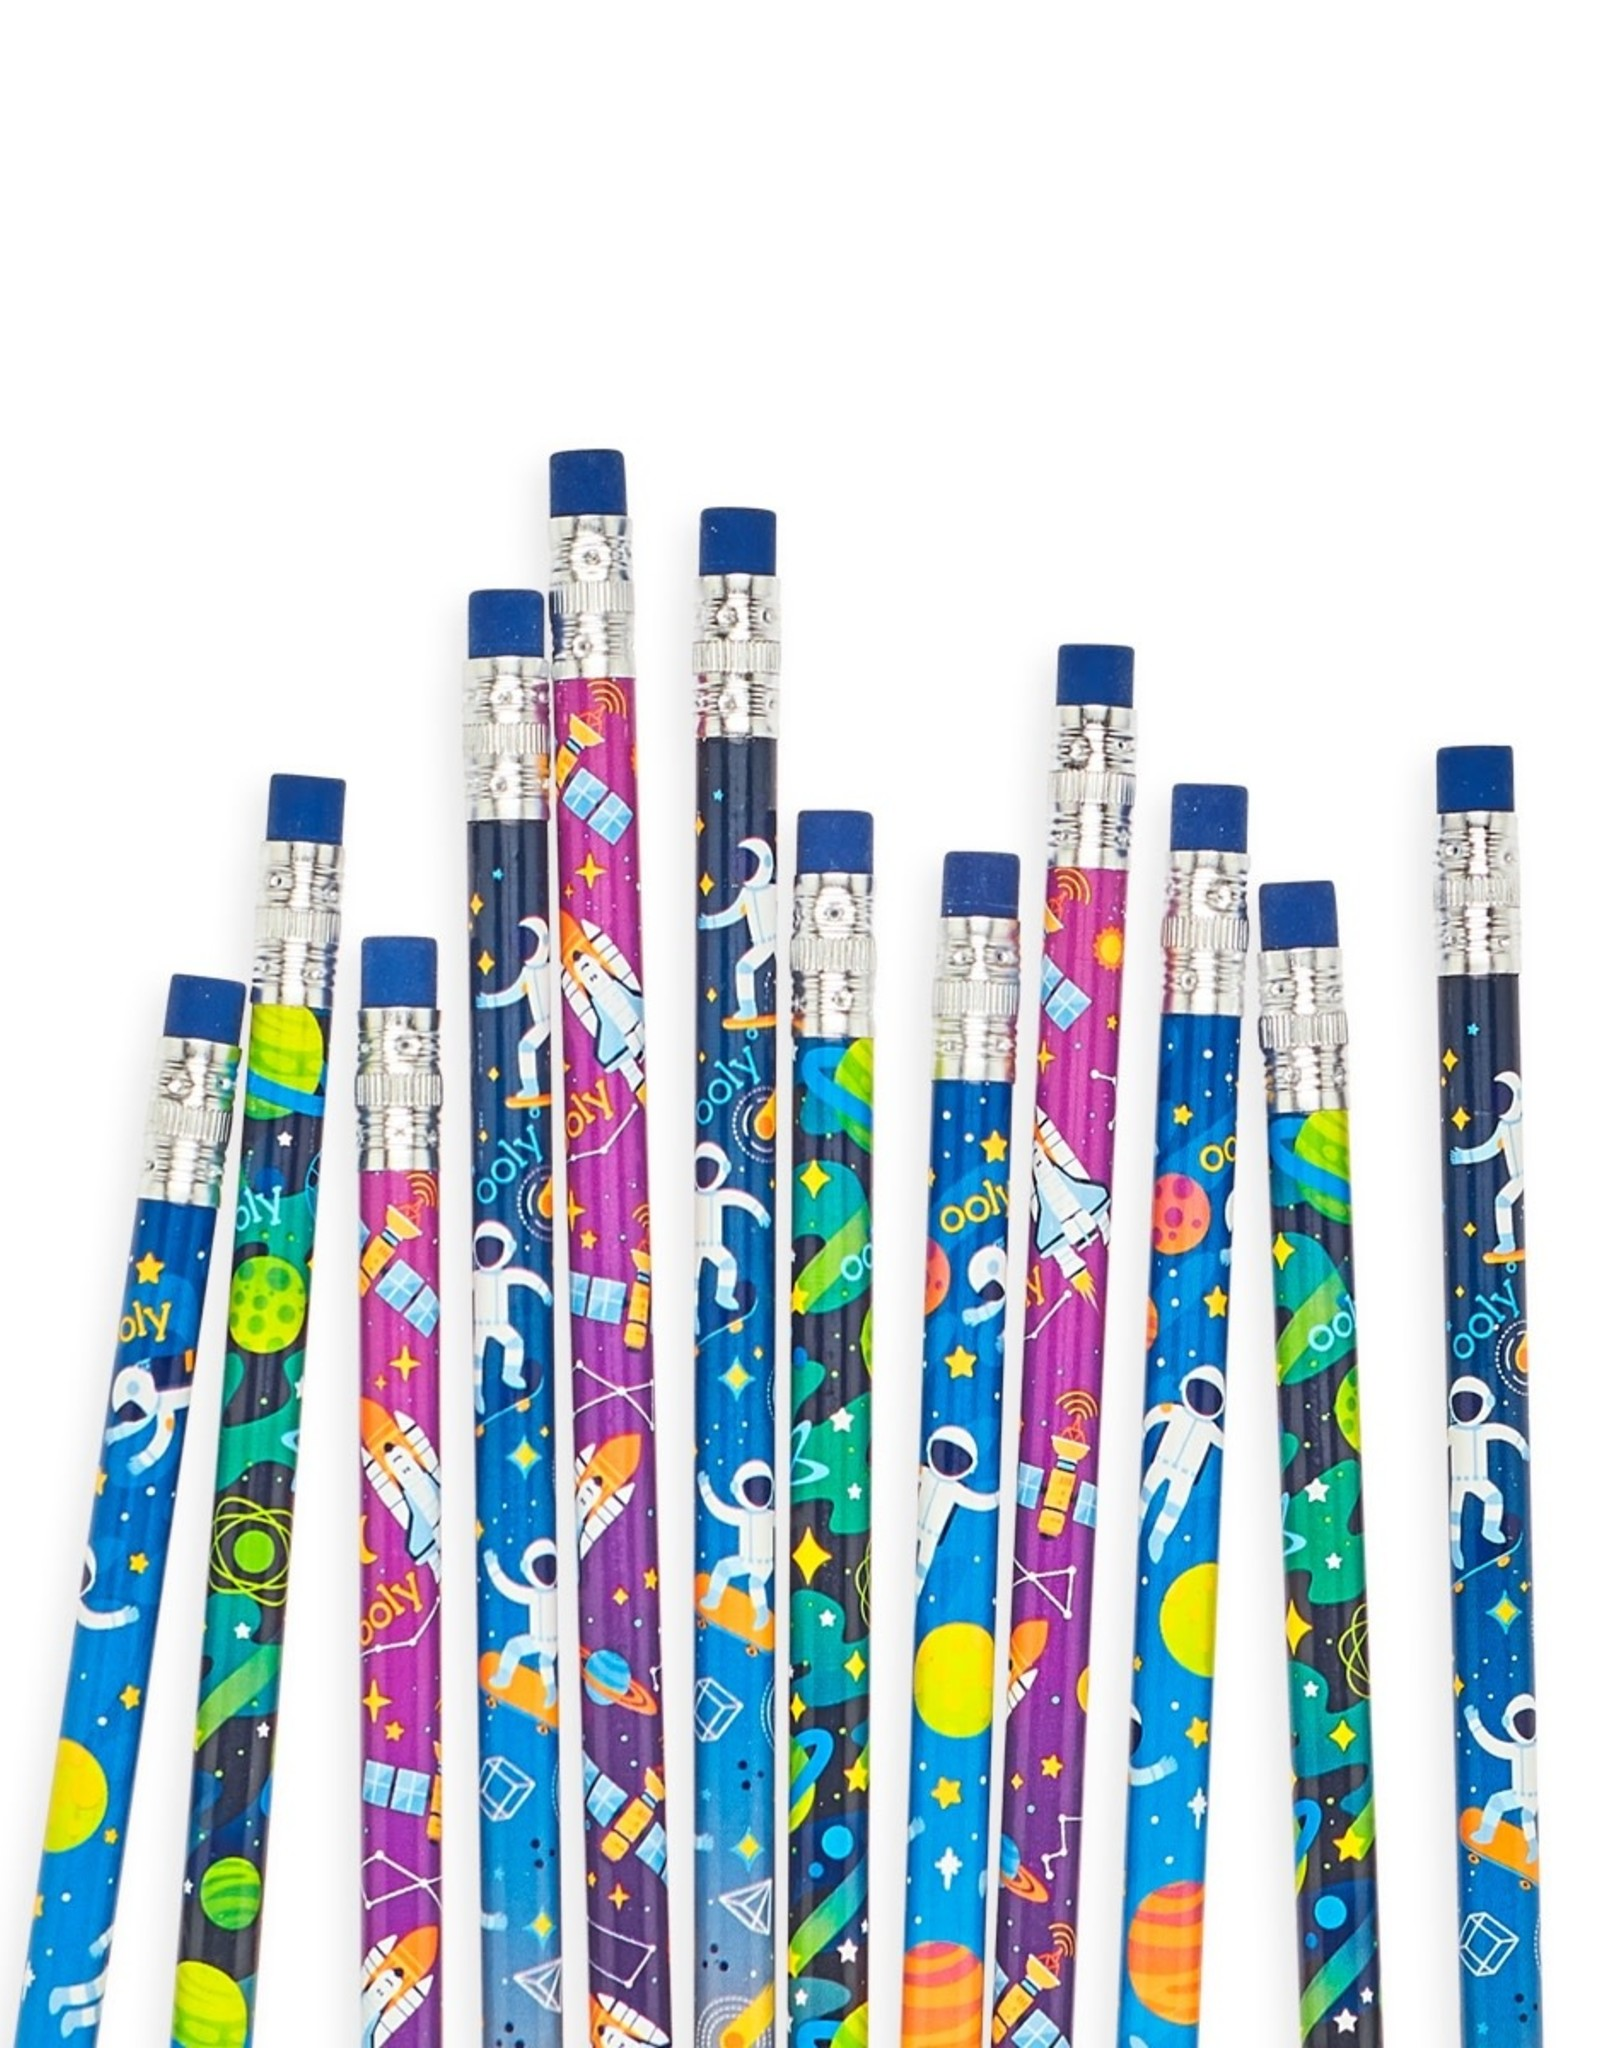 ooly Astronaut Graphite Pencils - Set of 12